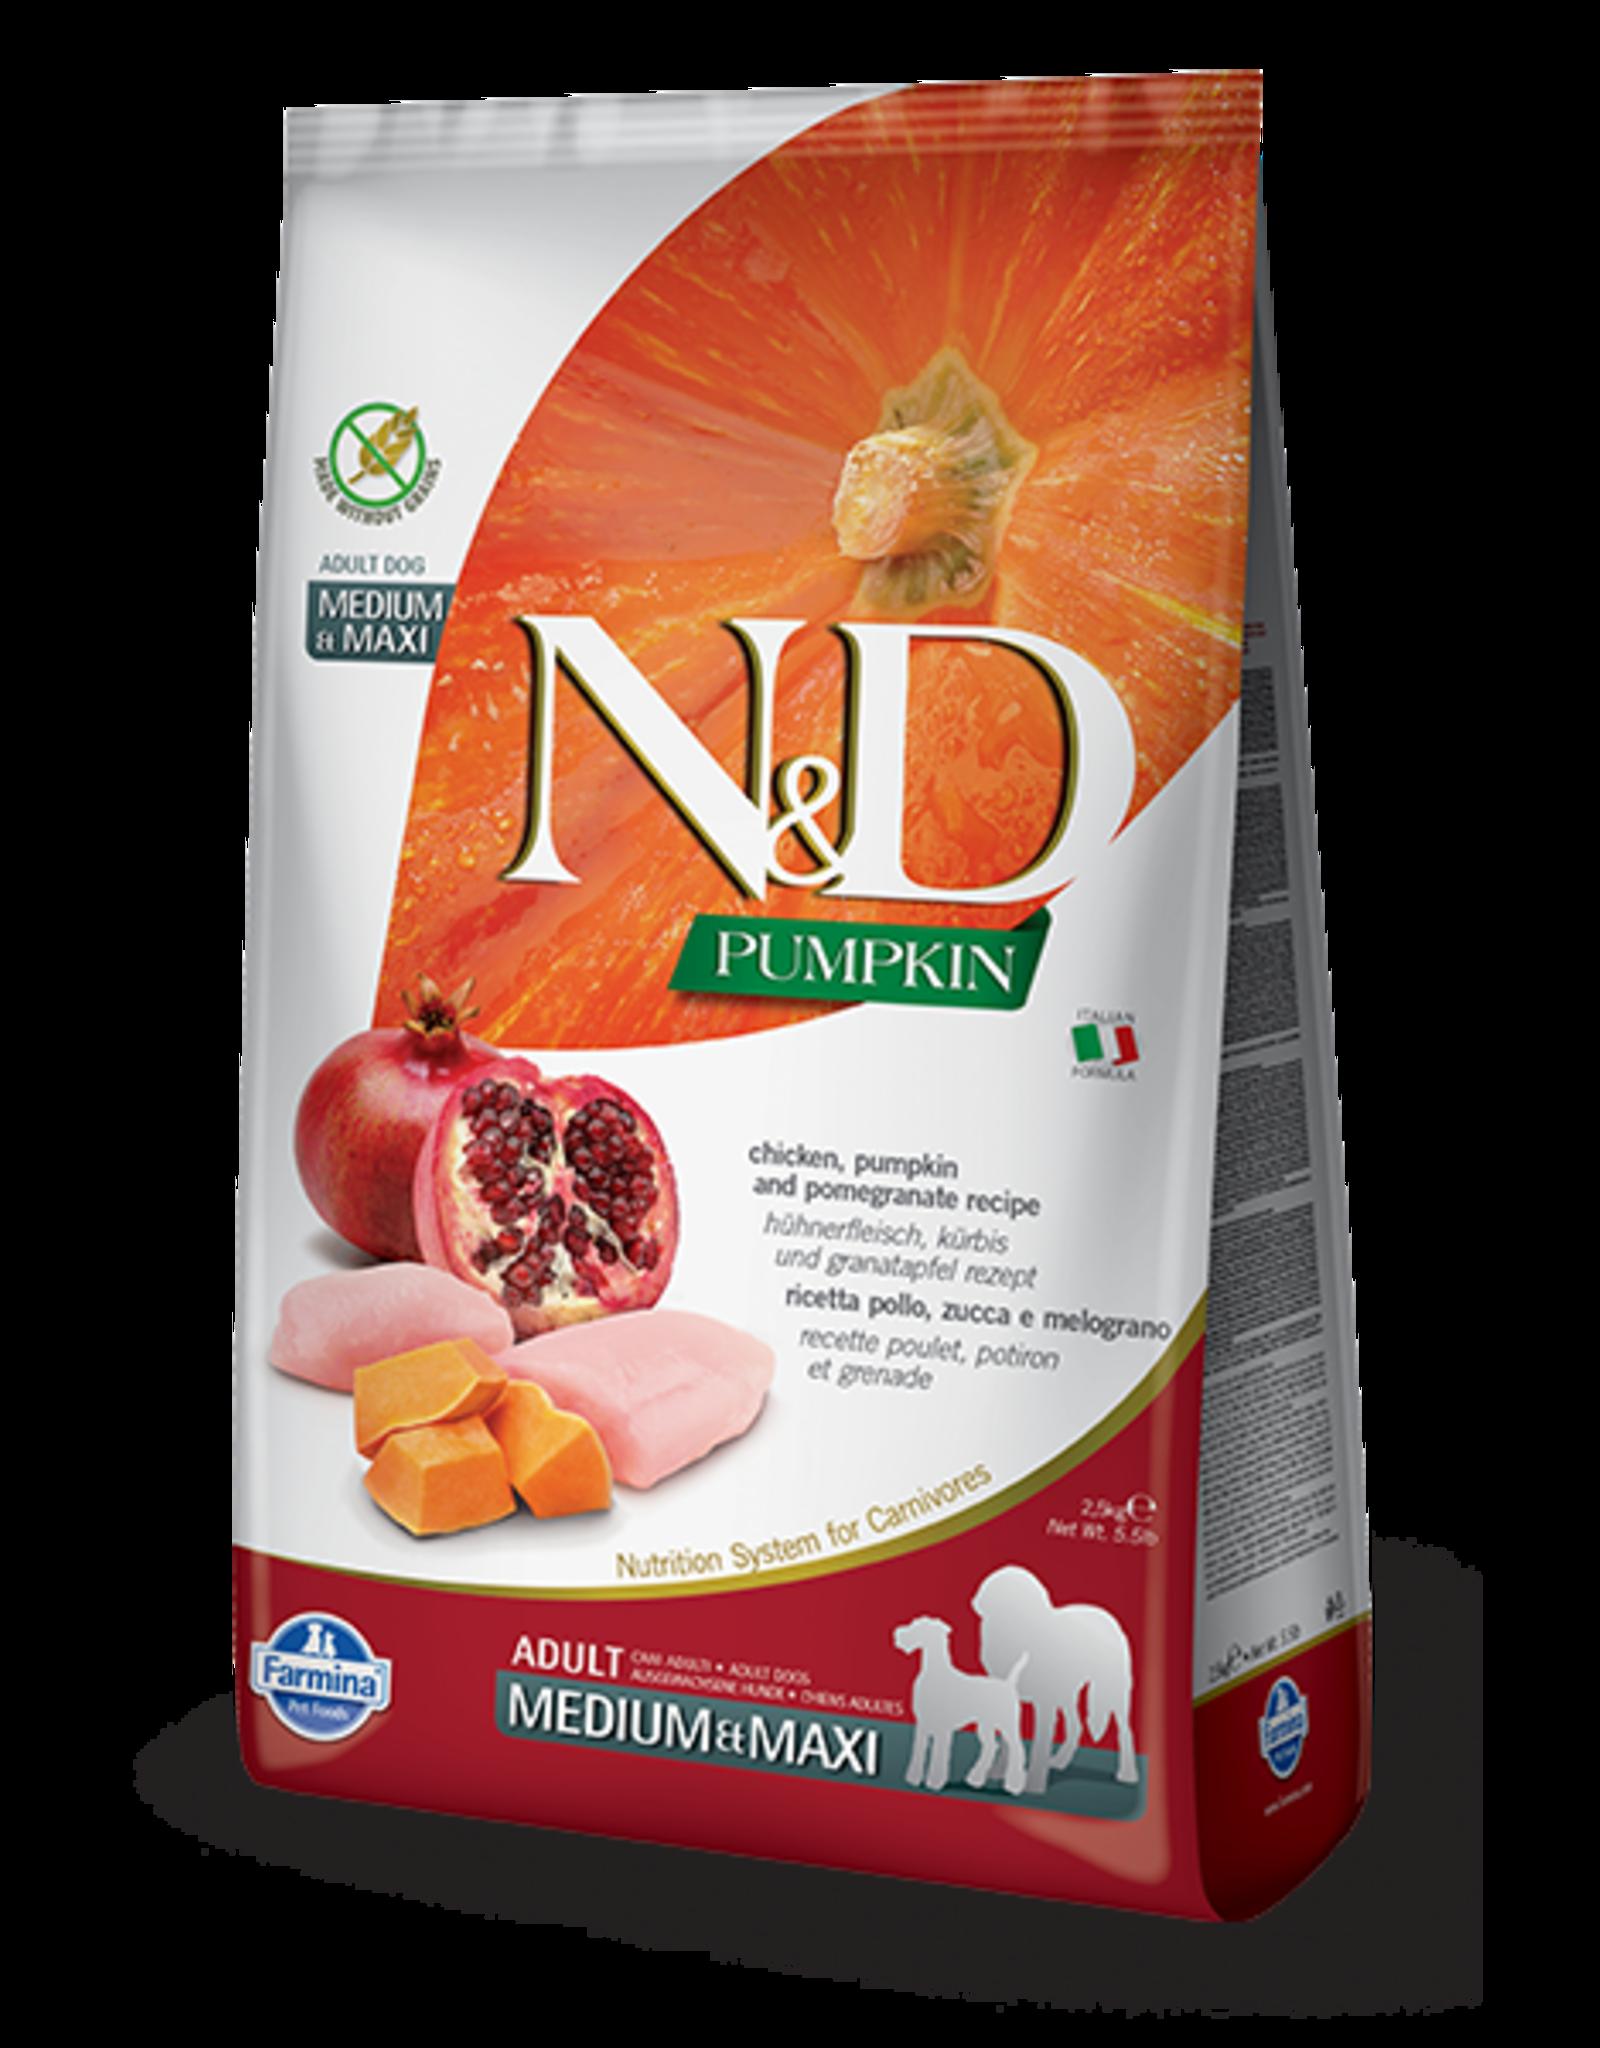 Farmina N&D Farmina N&D Pumpkin GF Chicken, Pumpkin & Pomegranate Adult Med/Max Dog Food